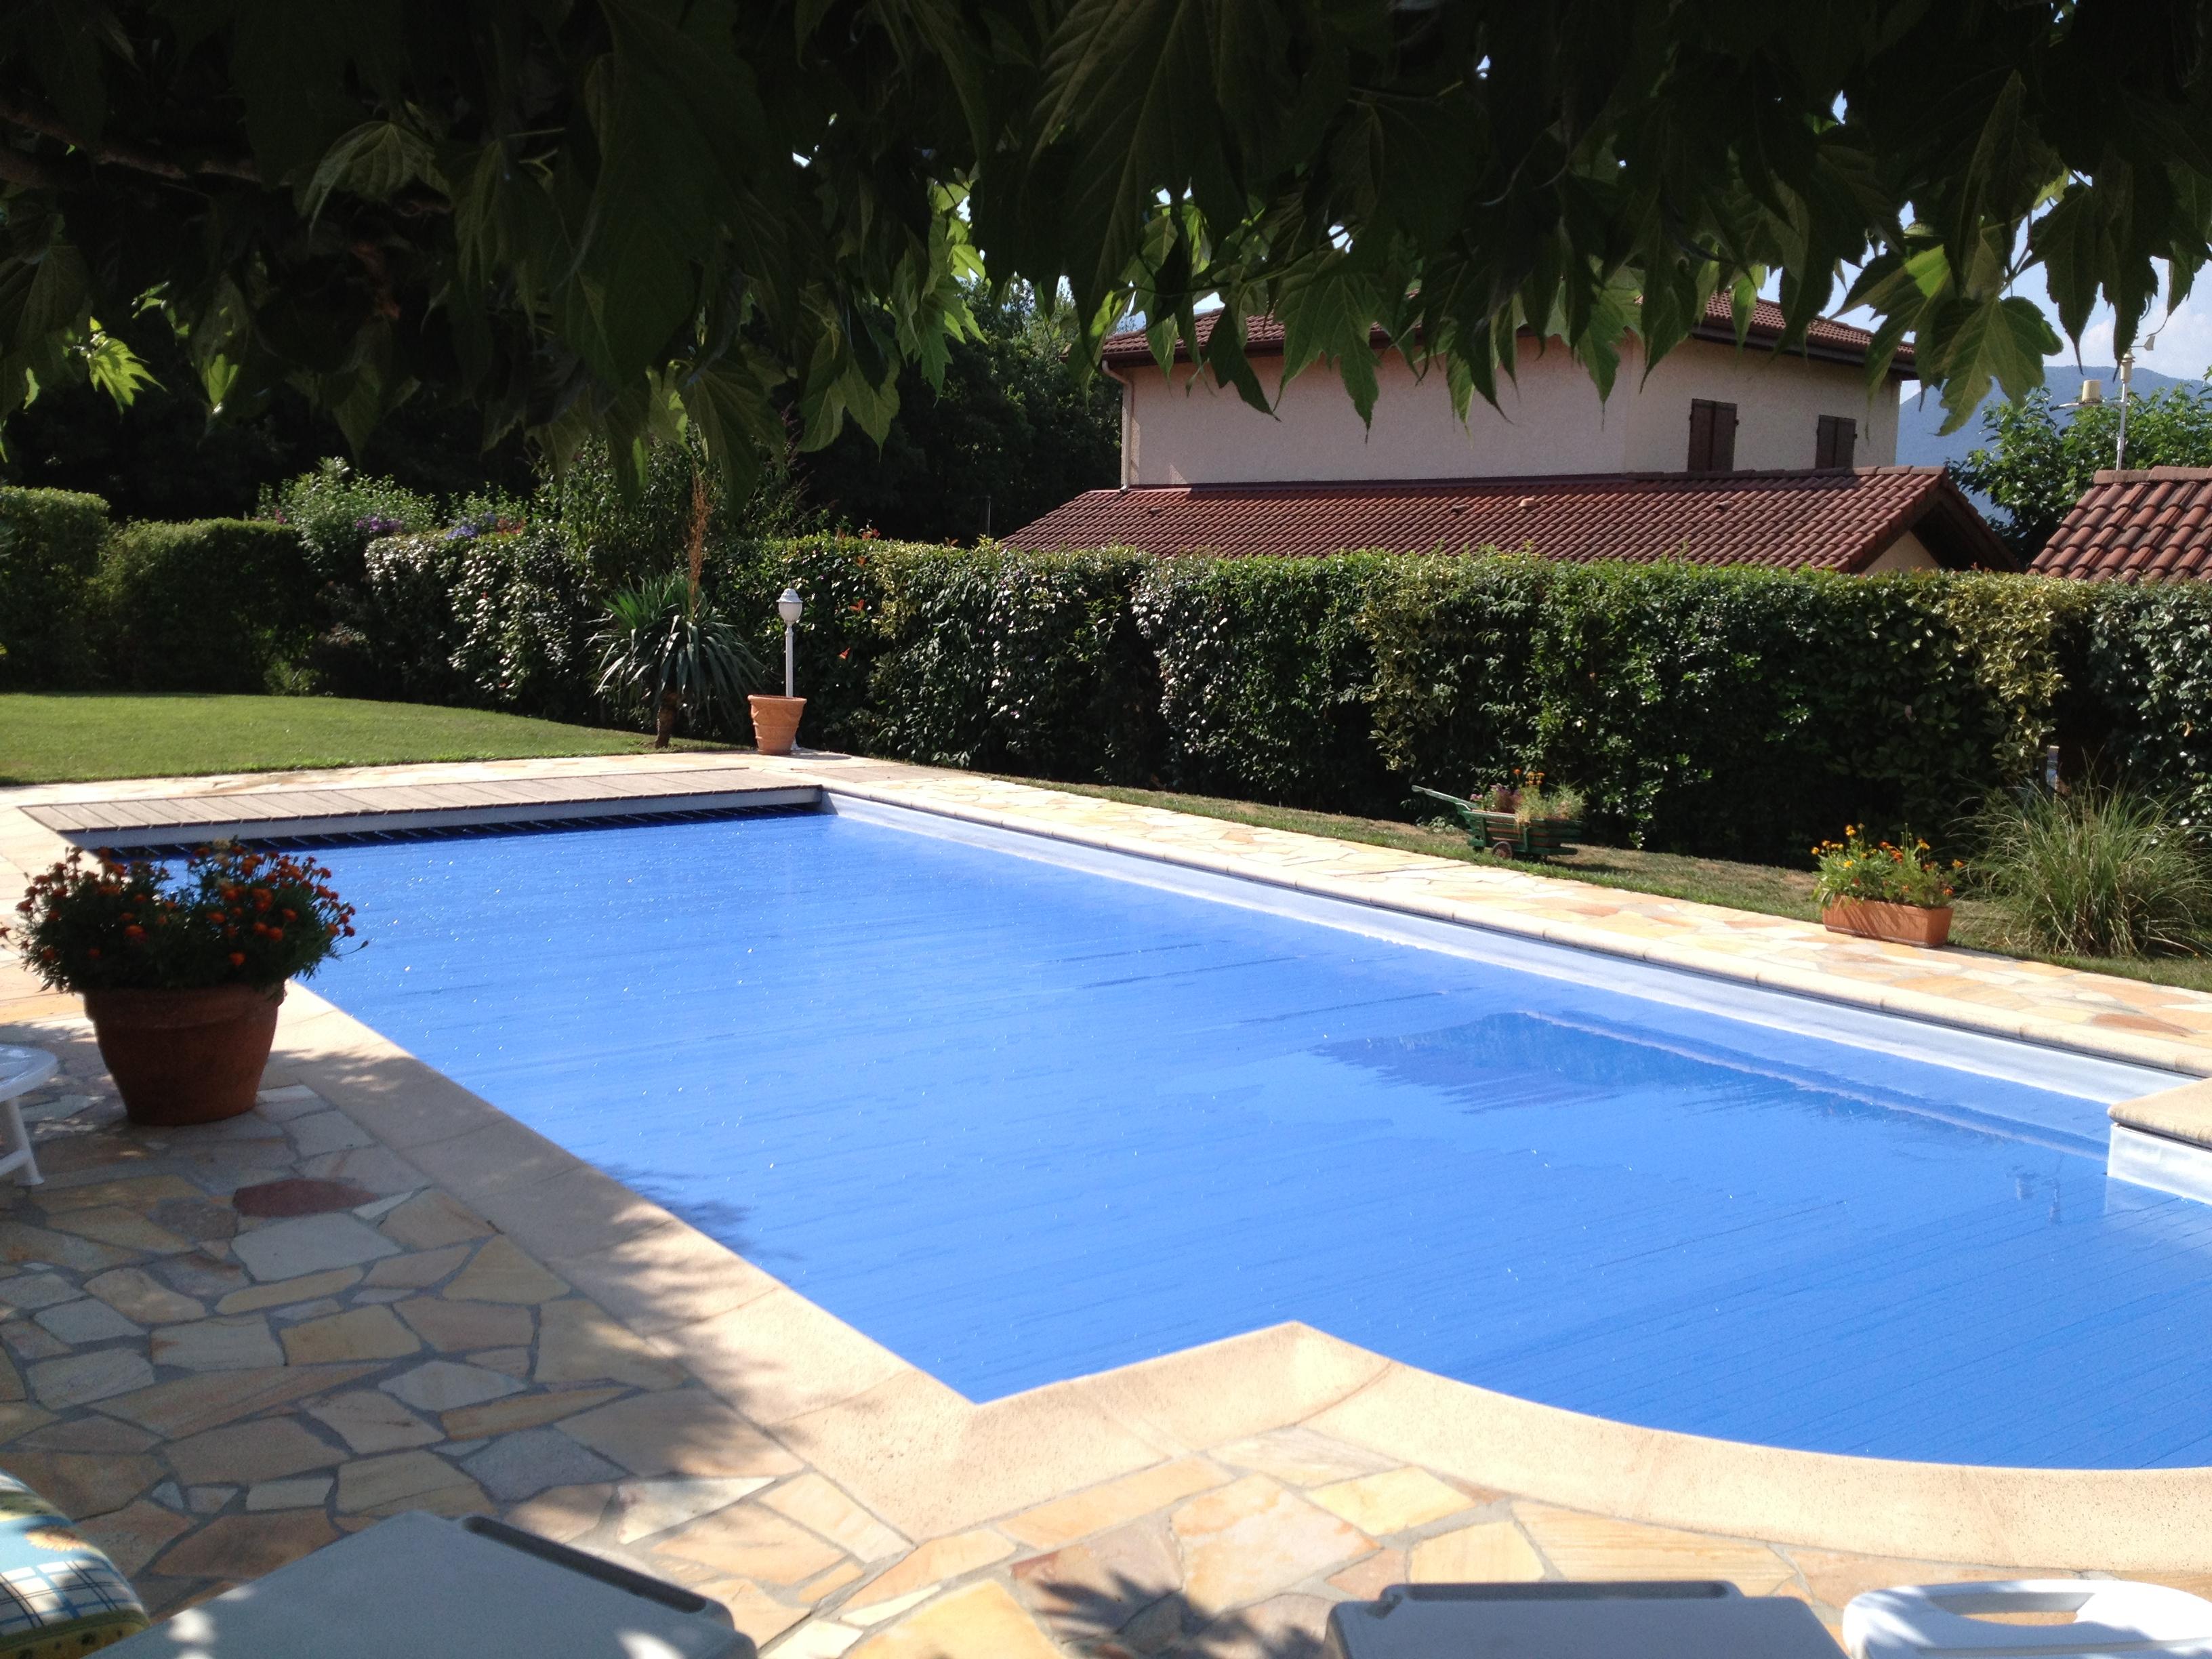 rideau de piscine immerg roulant coverline sp cialiste. Black Bedroom Furniture Sets. Home Design Ideas